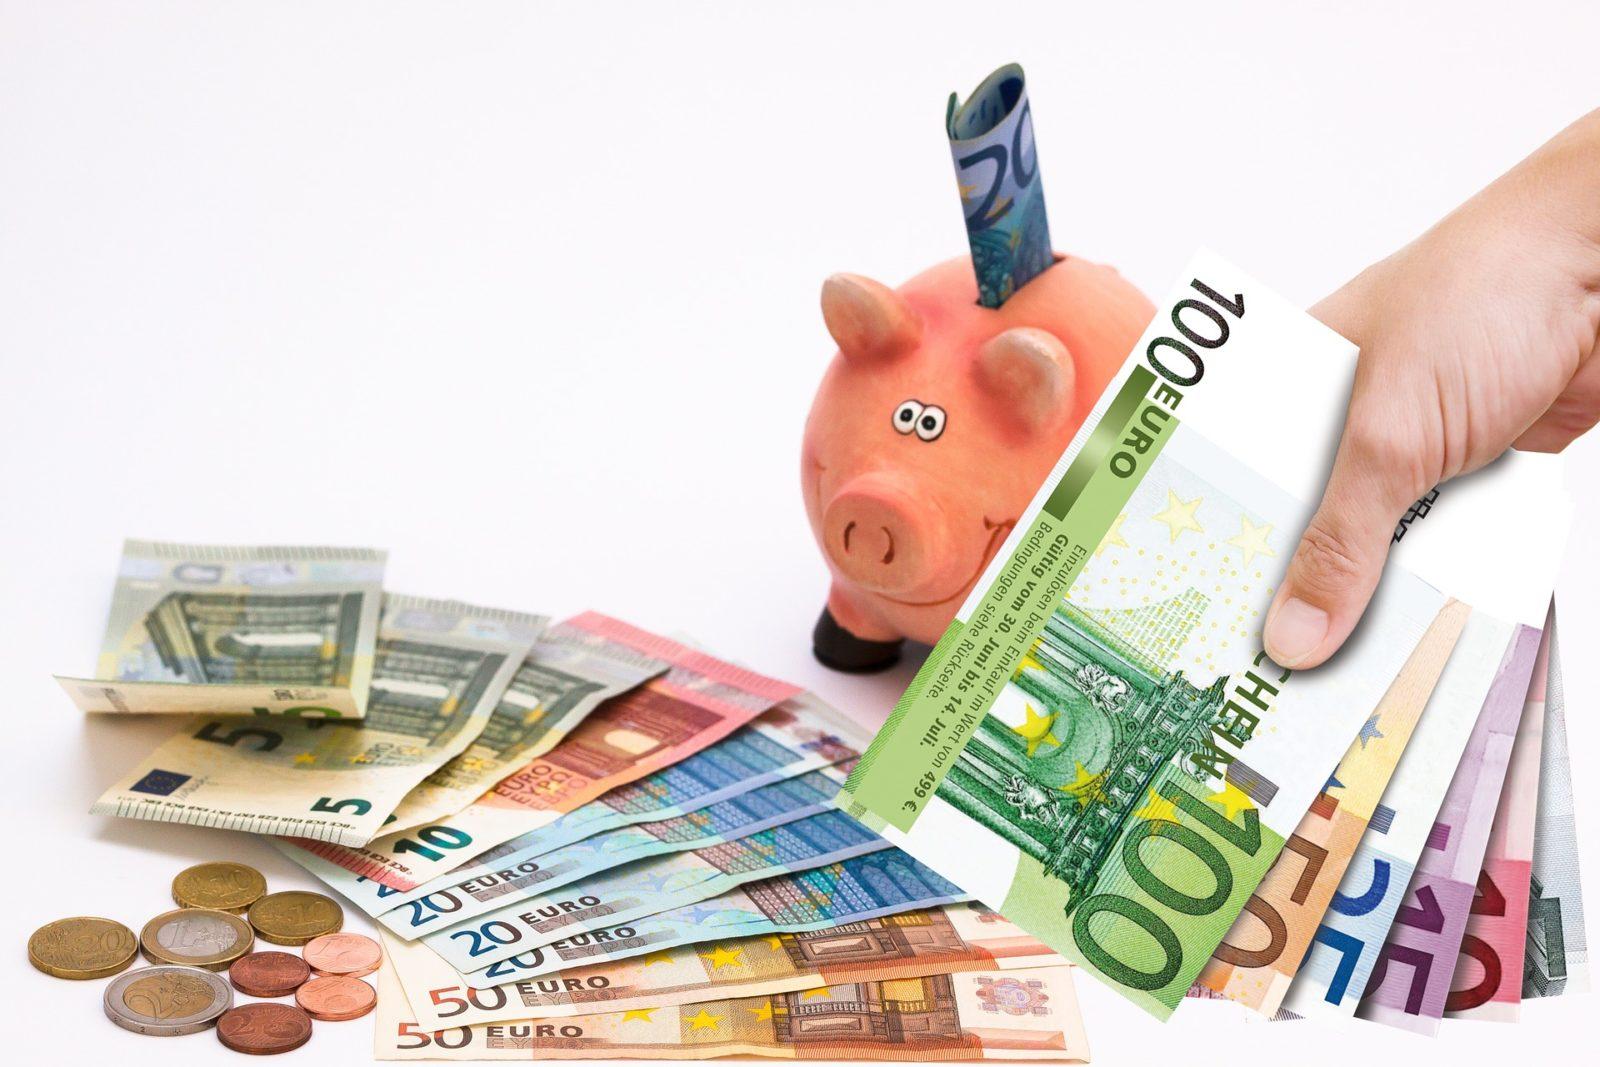 Копилка, банкноты, монеты